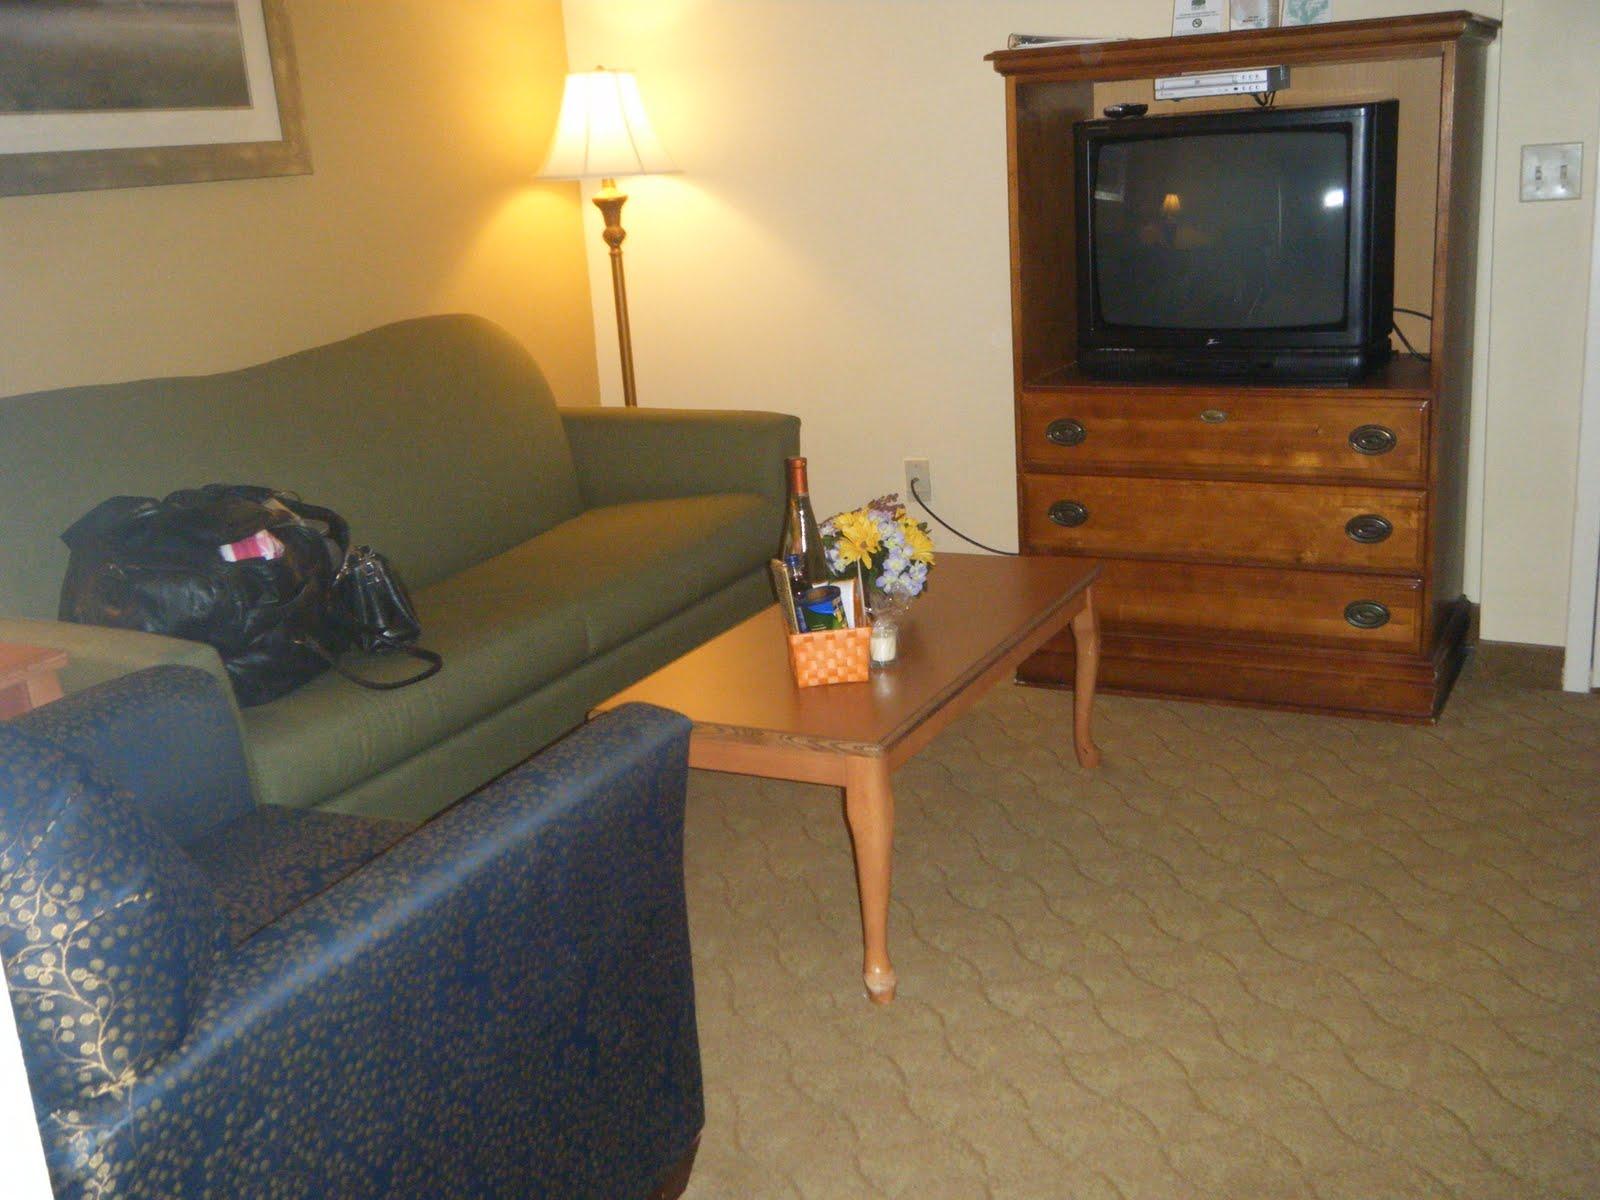 hotels jacksonville florida discount hotels jacksonville florida